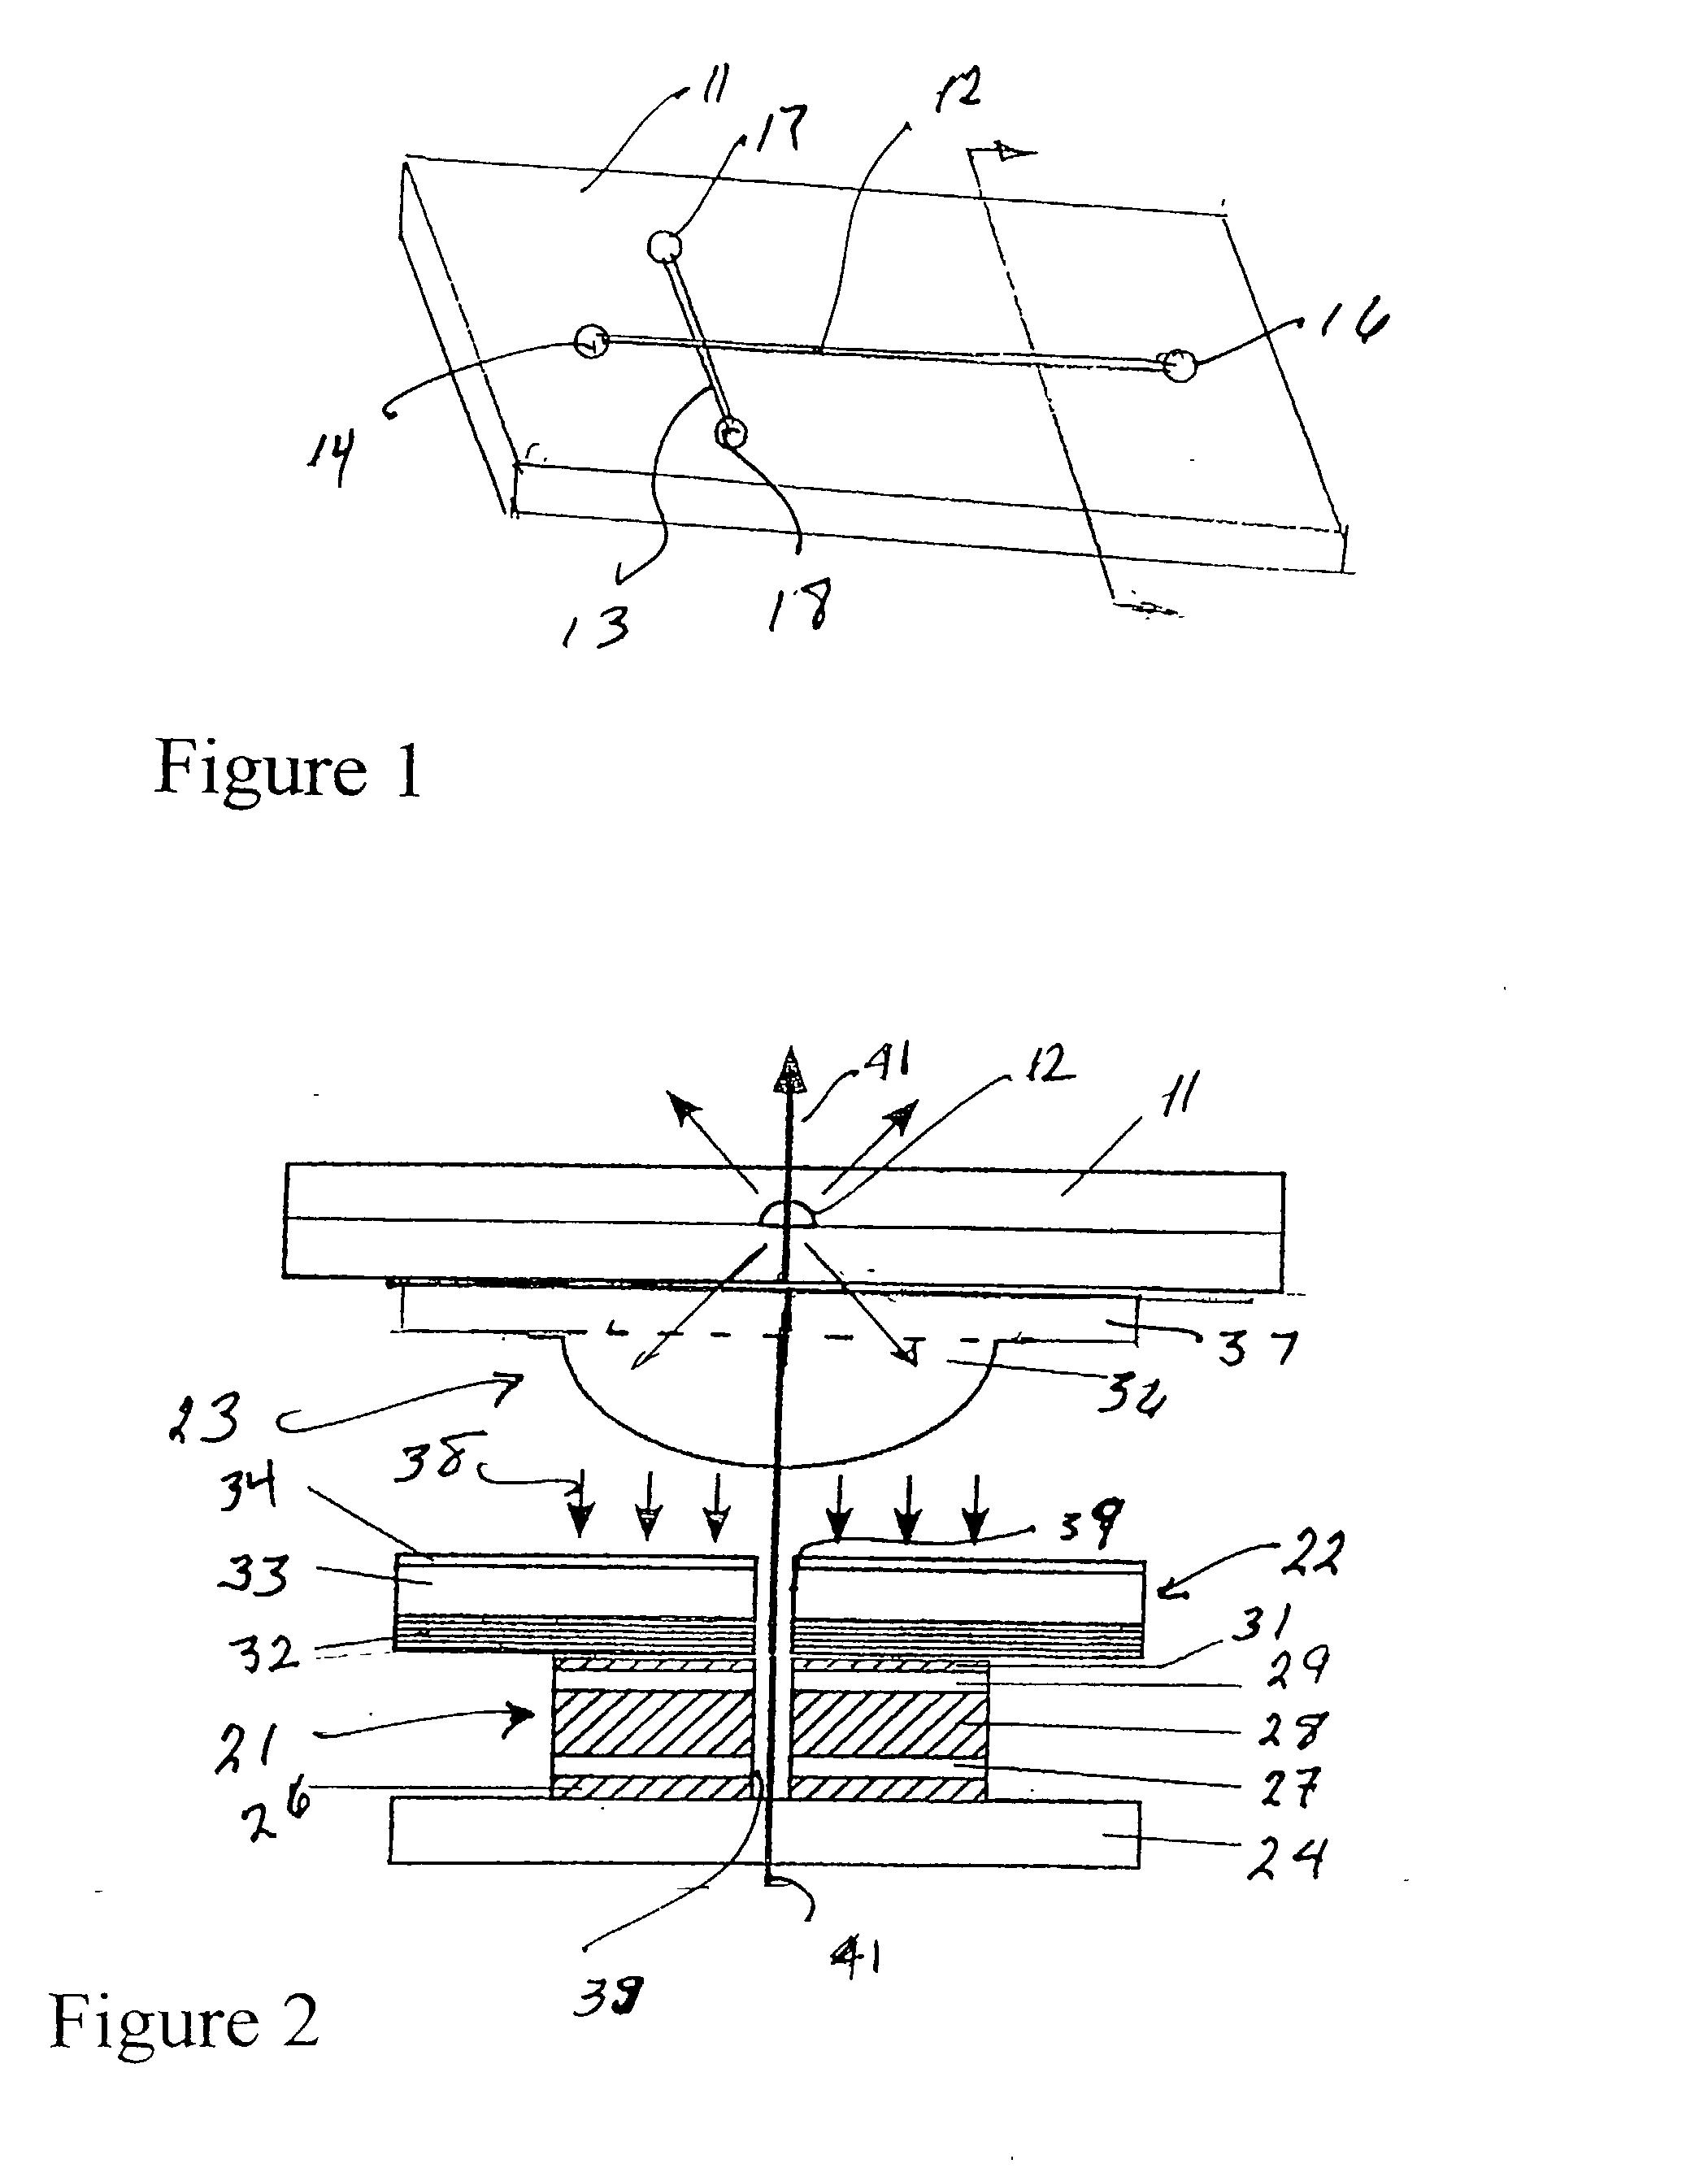 Rm 9164 2000 Dodge Neon Heater Fuse Box Diagram Wiring Diagram